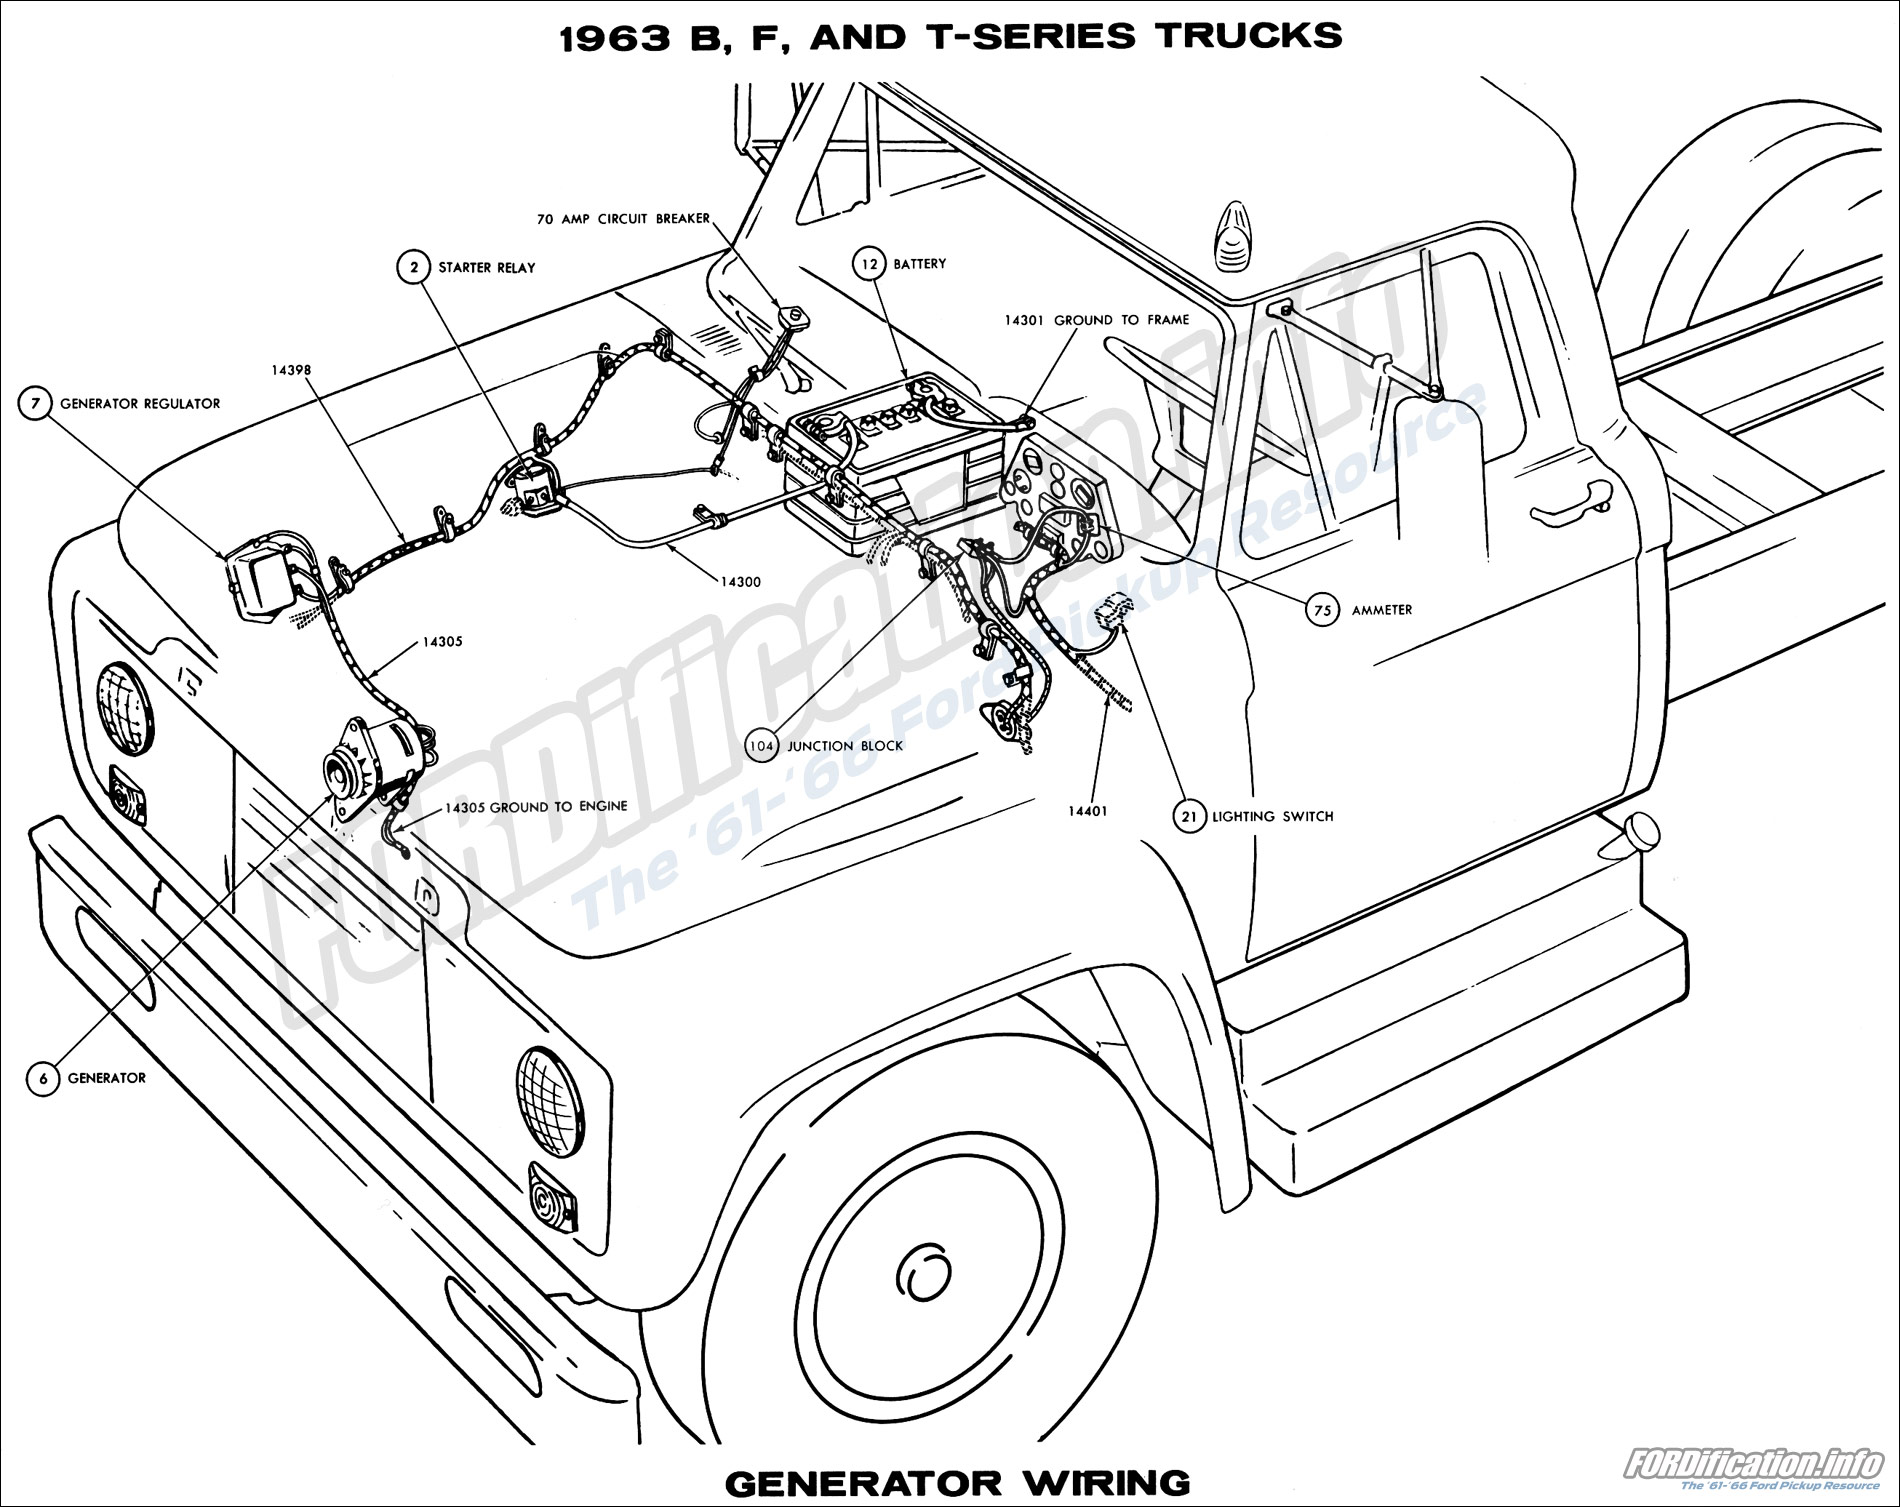 1963 Ford Wiring Diagram